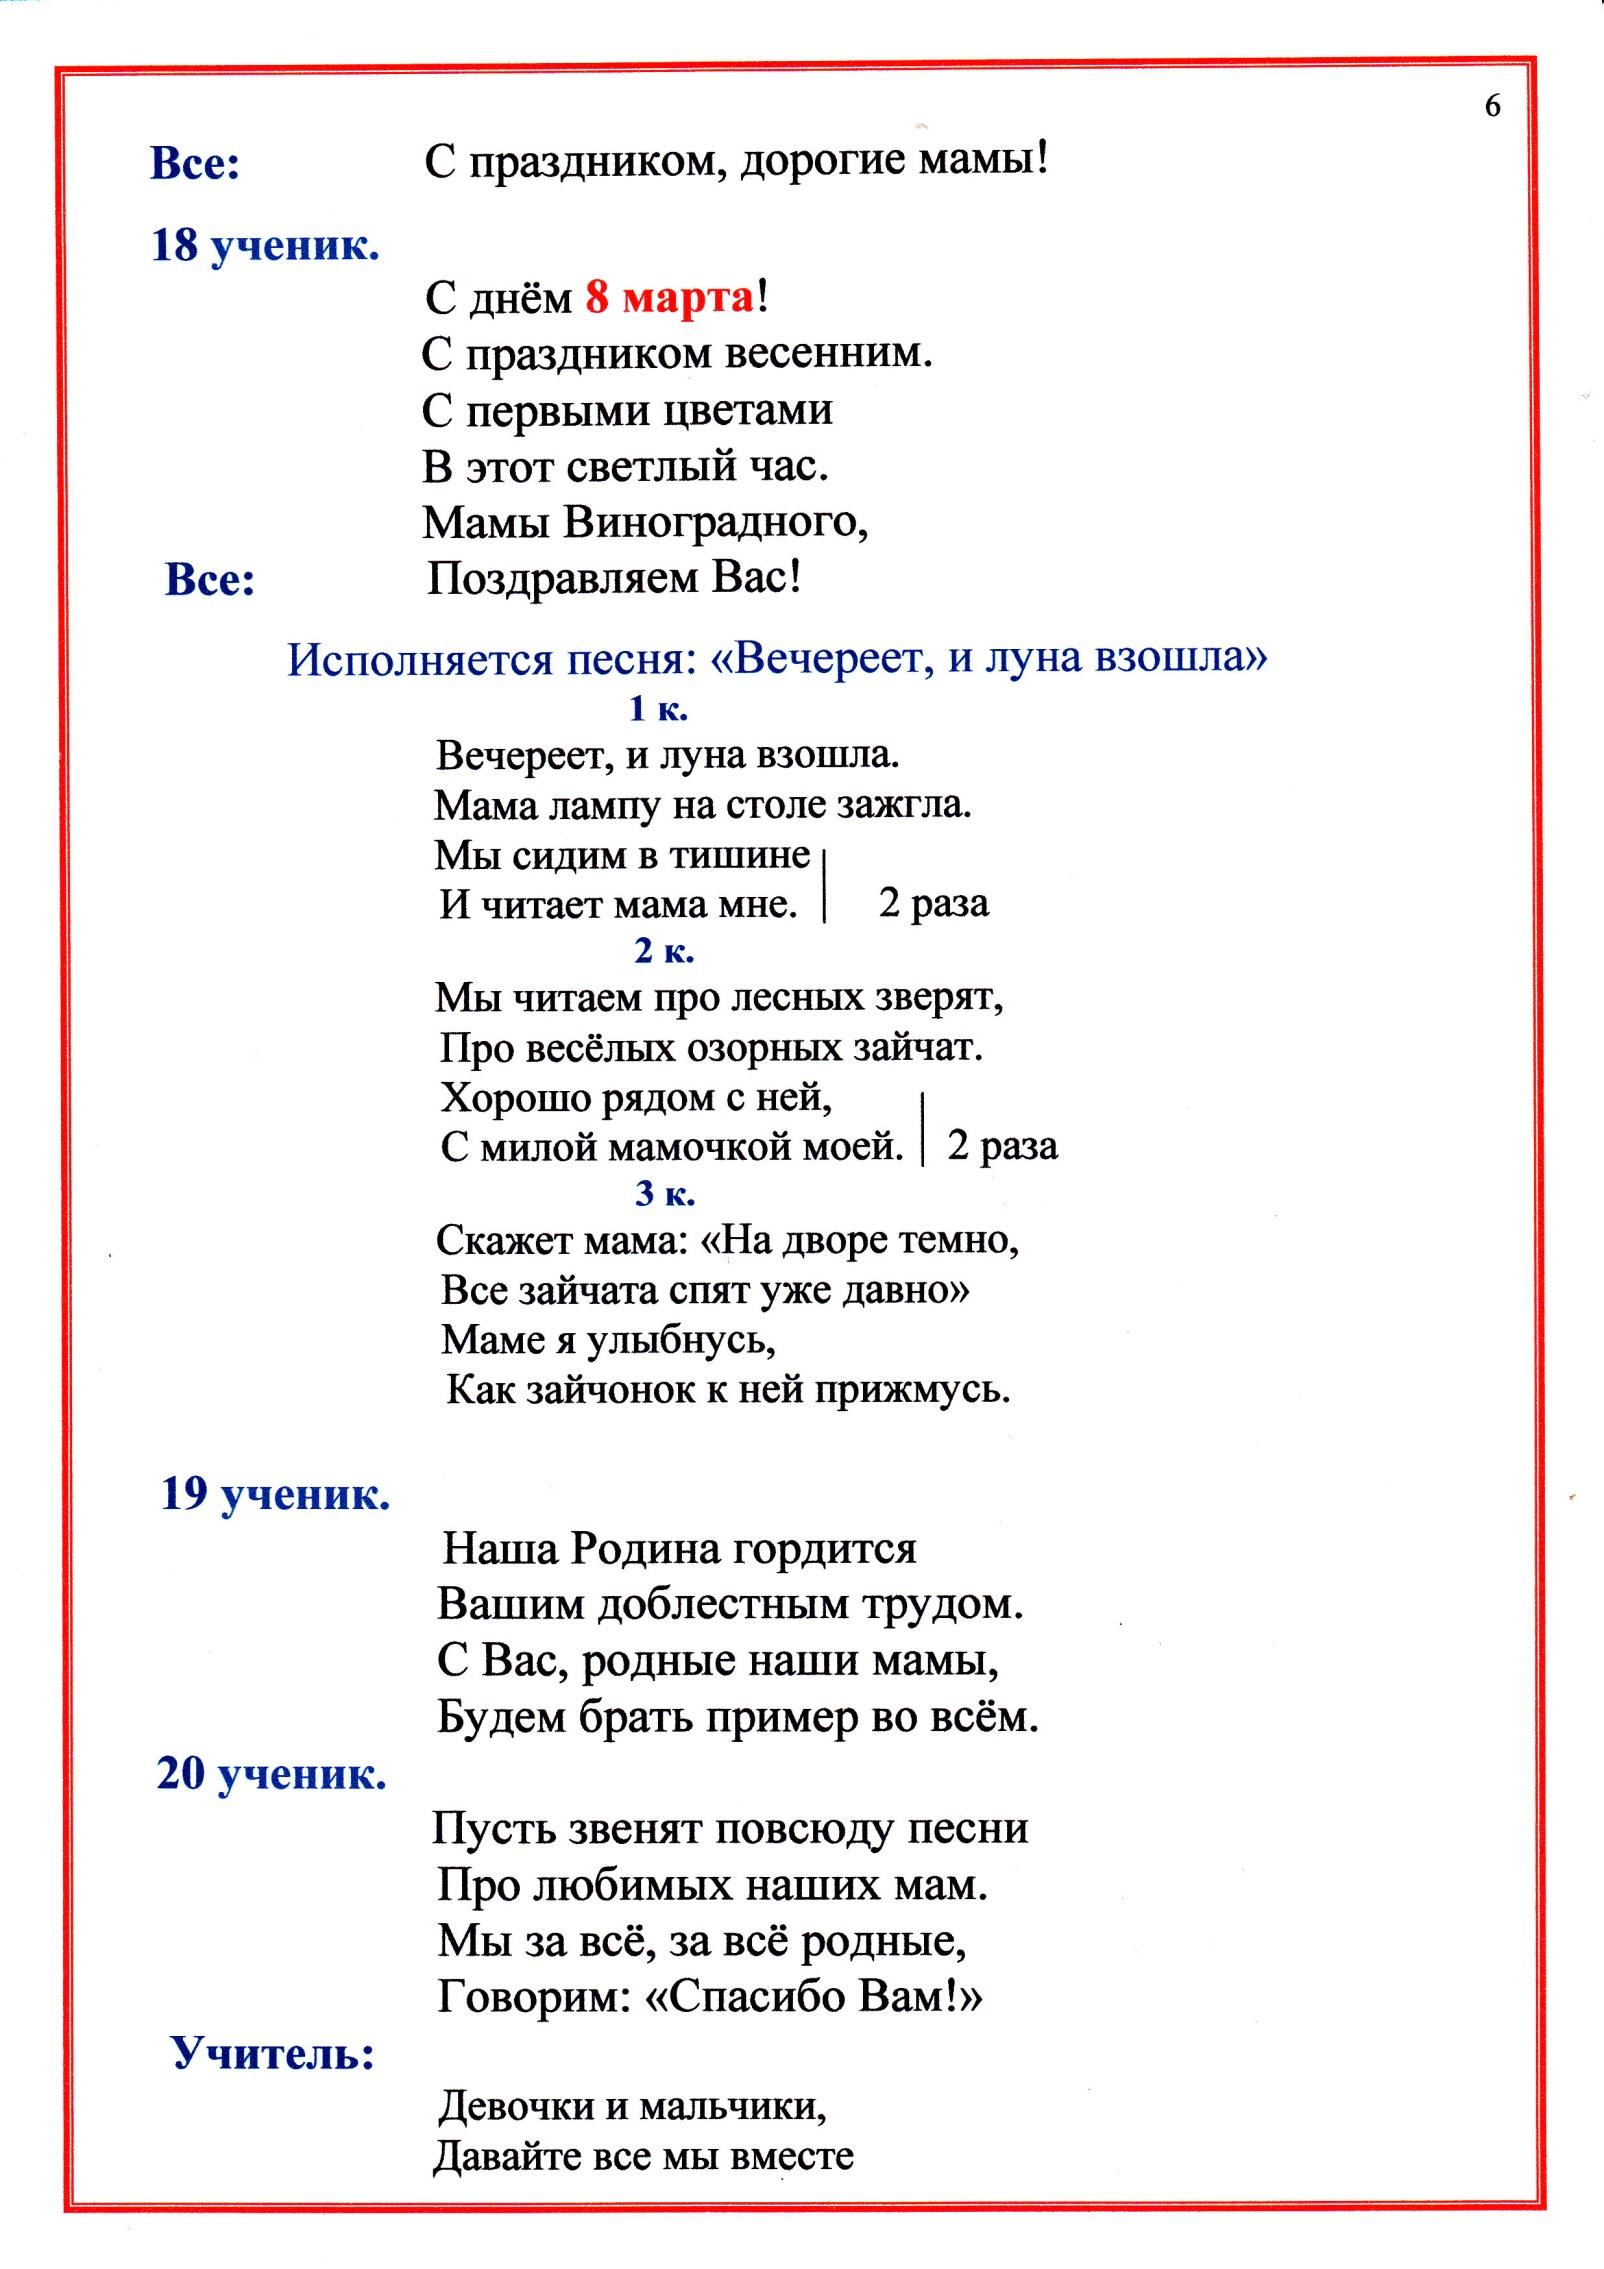 C:\Documents and Settings\Admin\Мои документы\Мои рисунки\MP Navigator EX\2009_12_01\IMG_0005.jpg